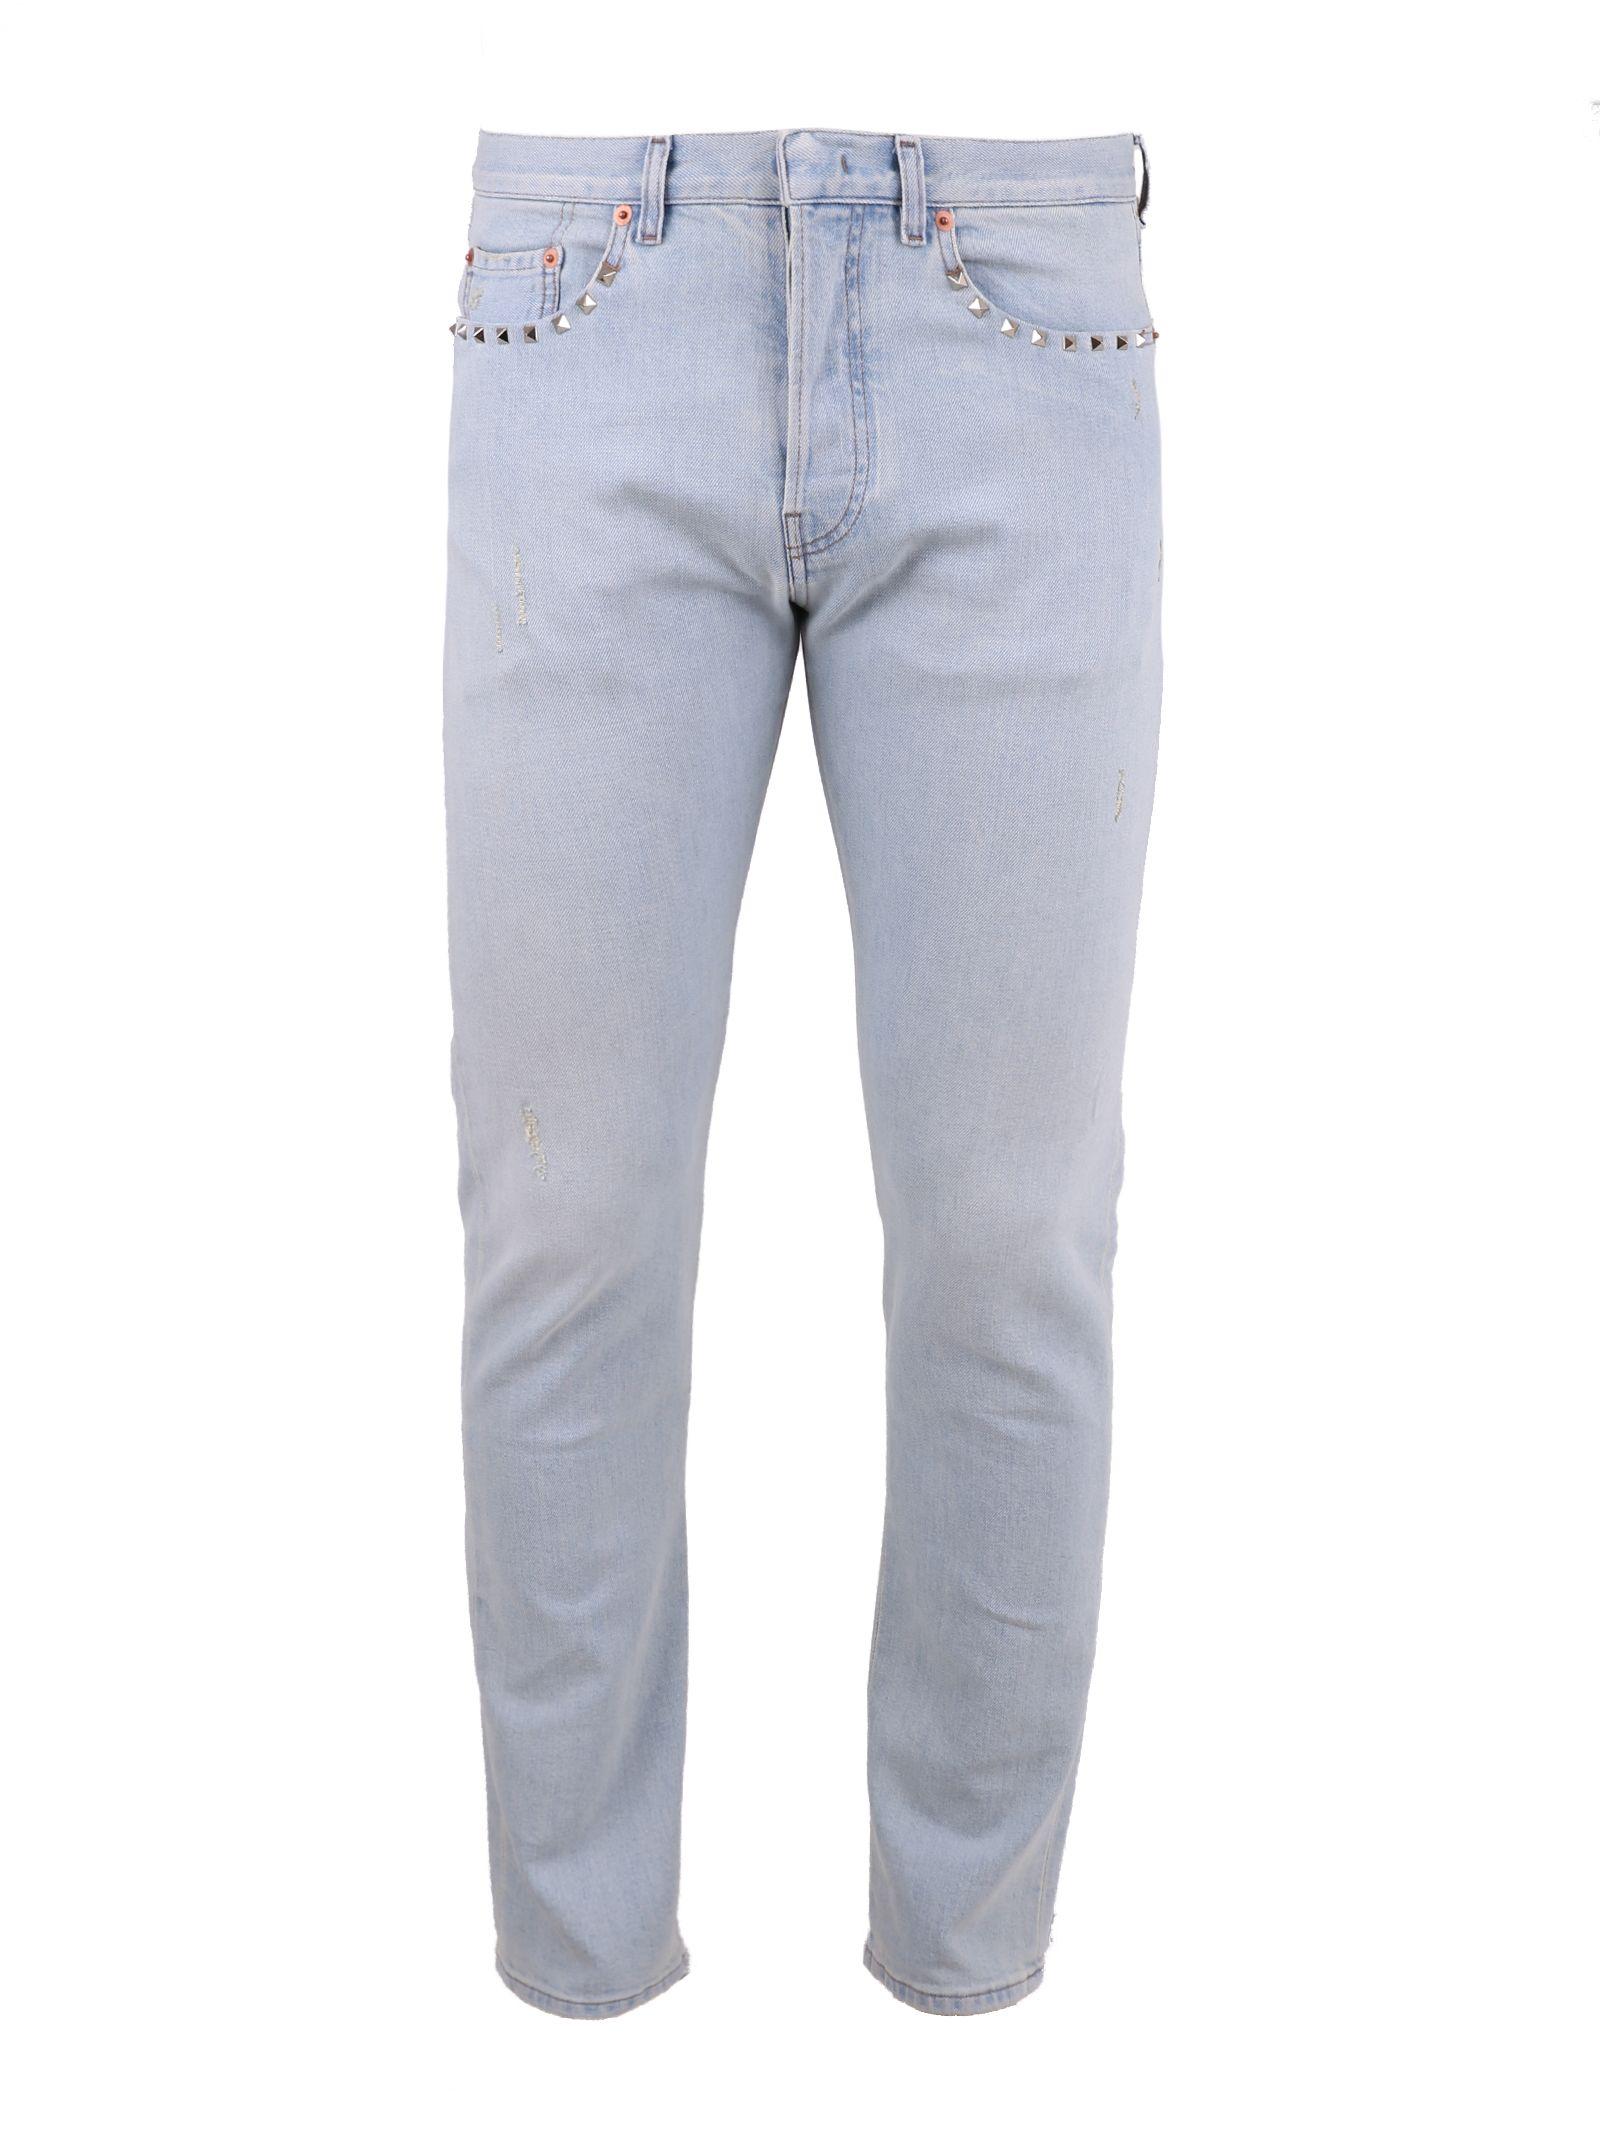 Studded Denim Jeans 10540667